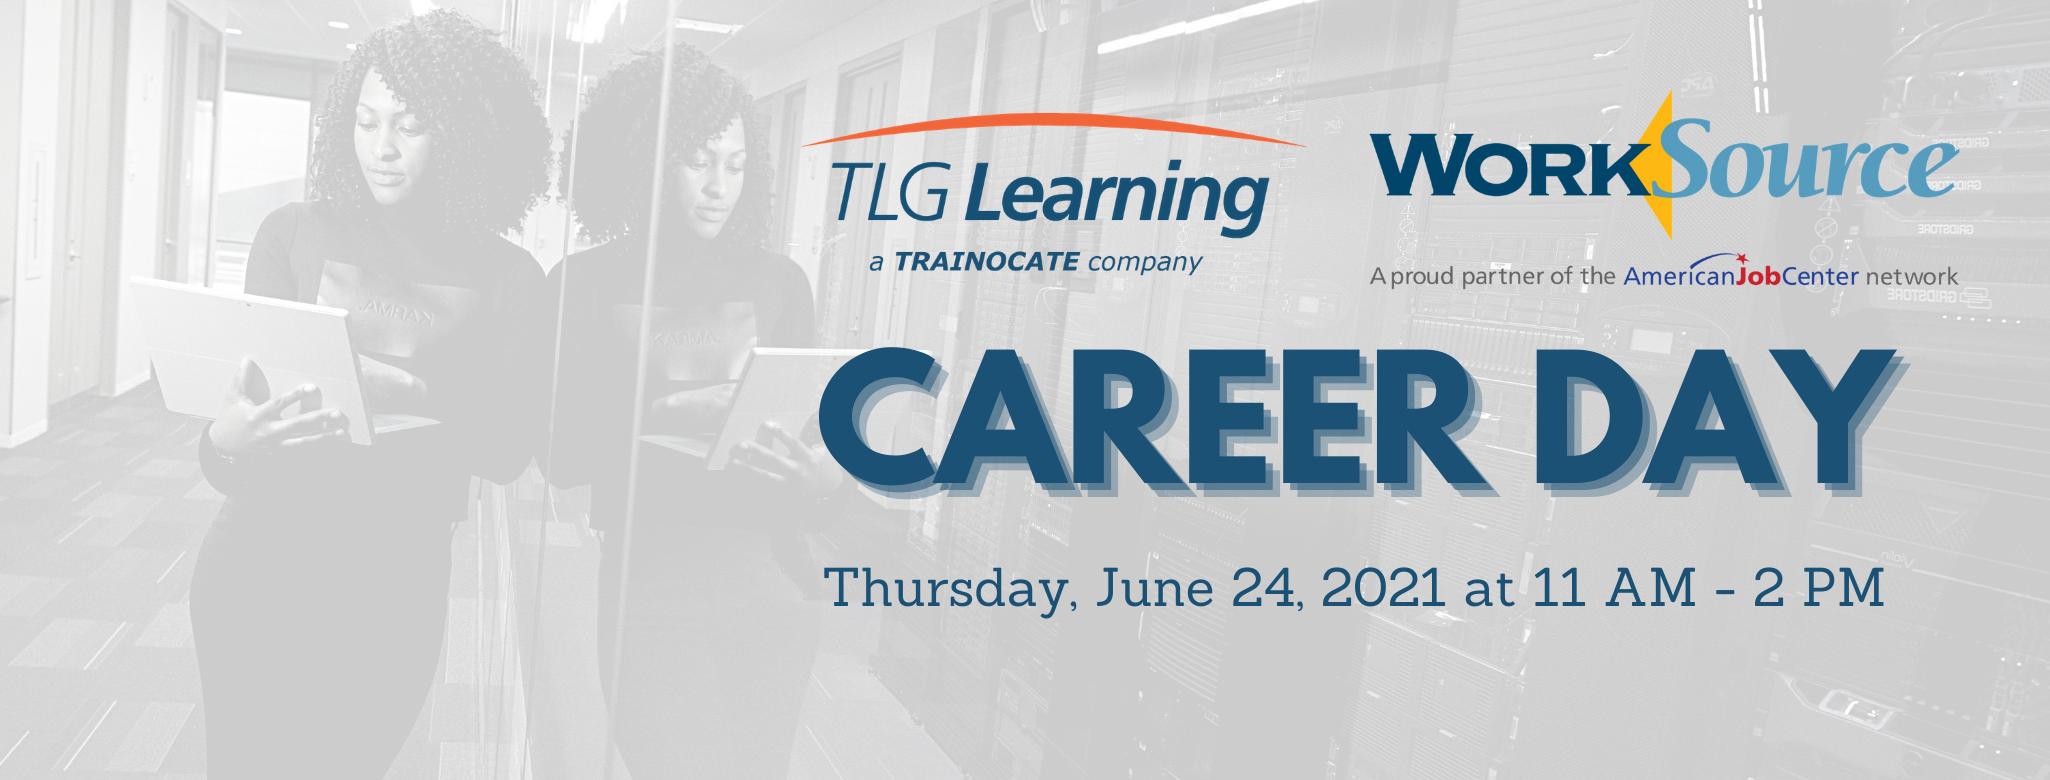 WorkSource Career Day Header 2021-06-24